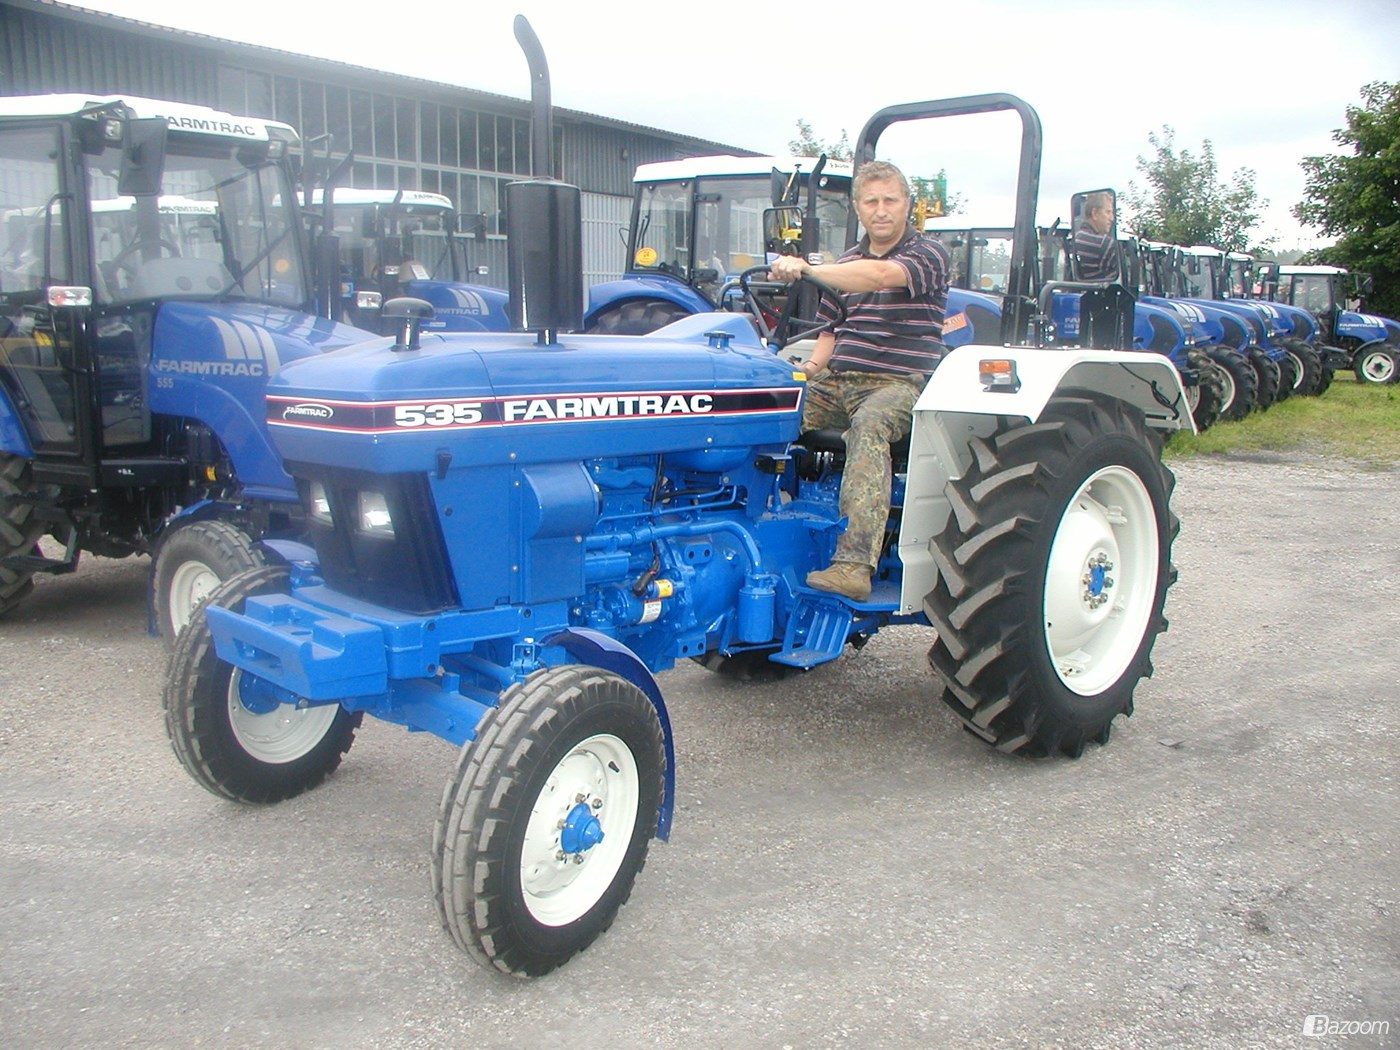 Farmtrac 535 Farm Tractor | Farmtrac Farm Tractors: Farmtrac